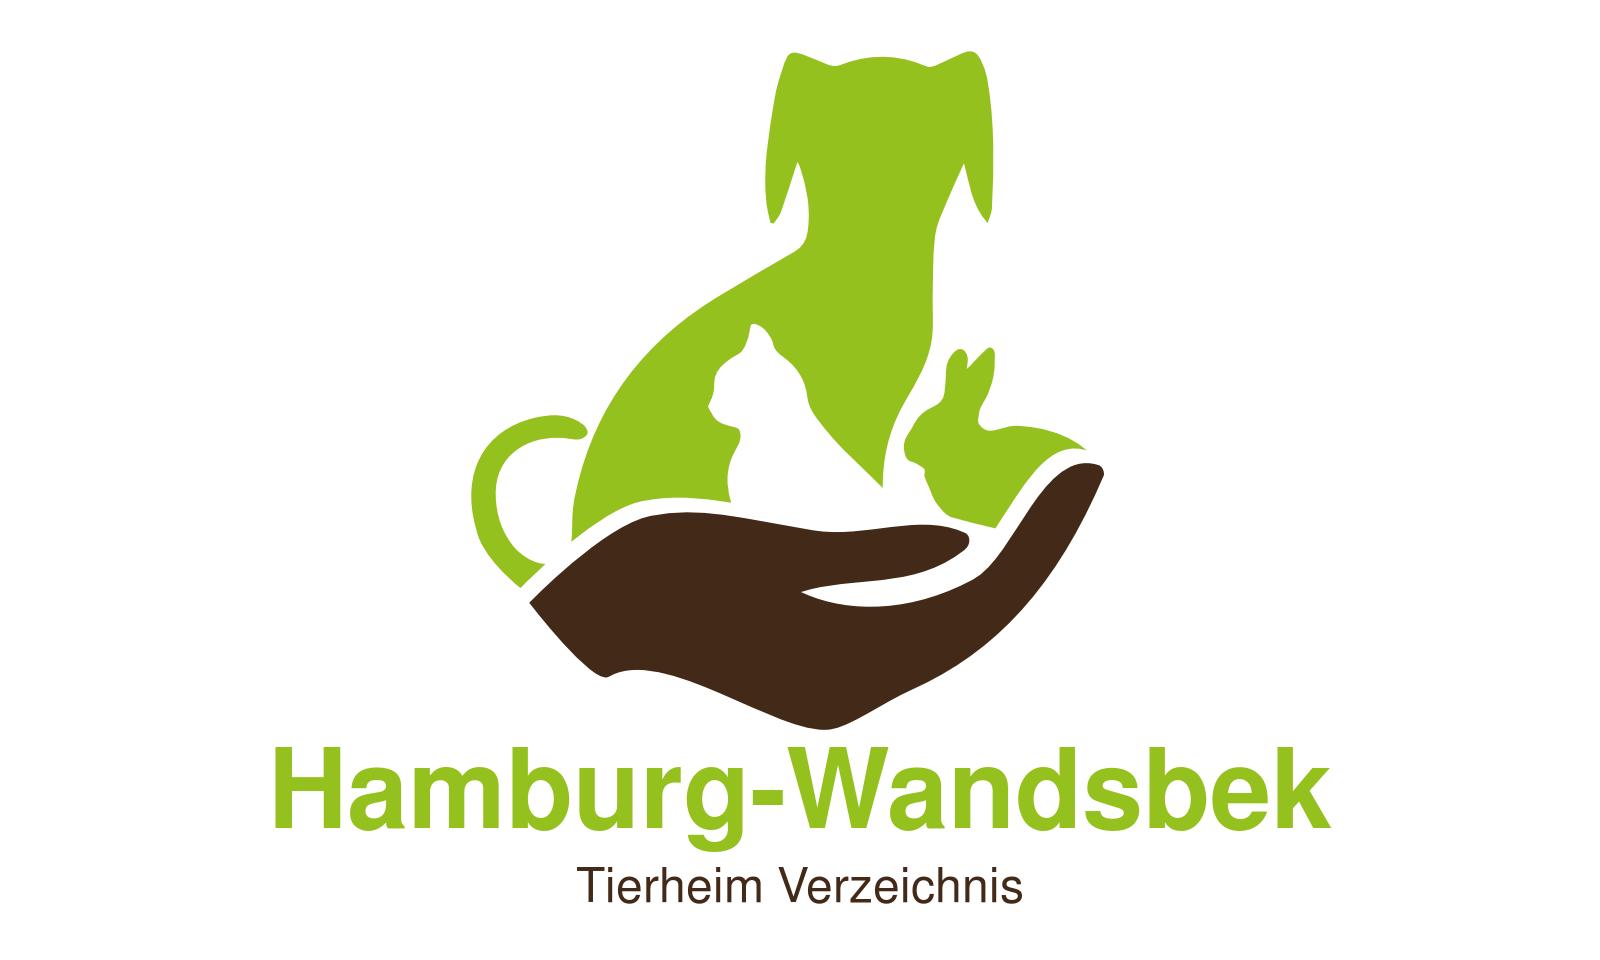 Tierheim Hamburg Wandsbek